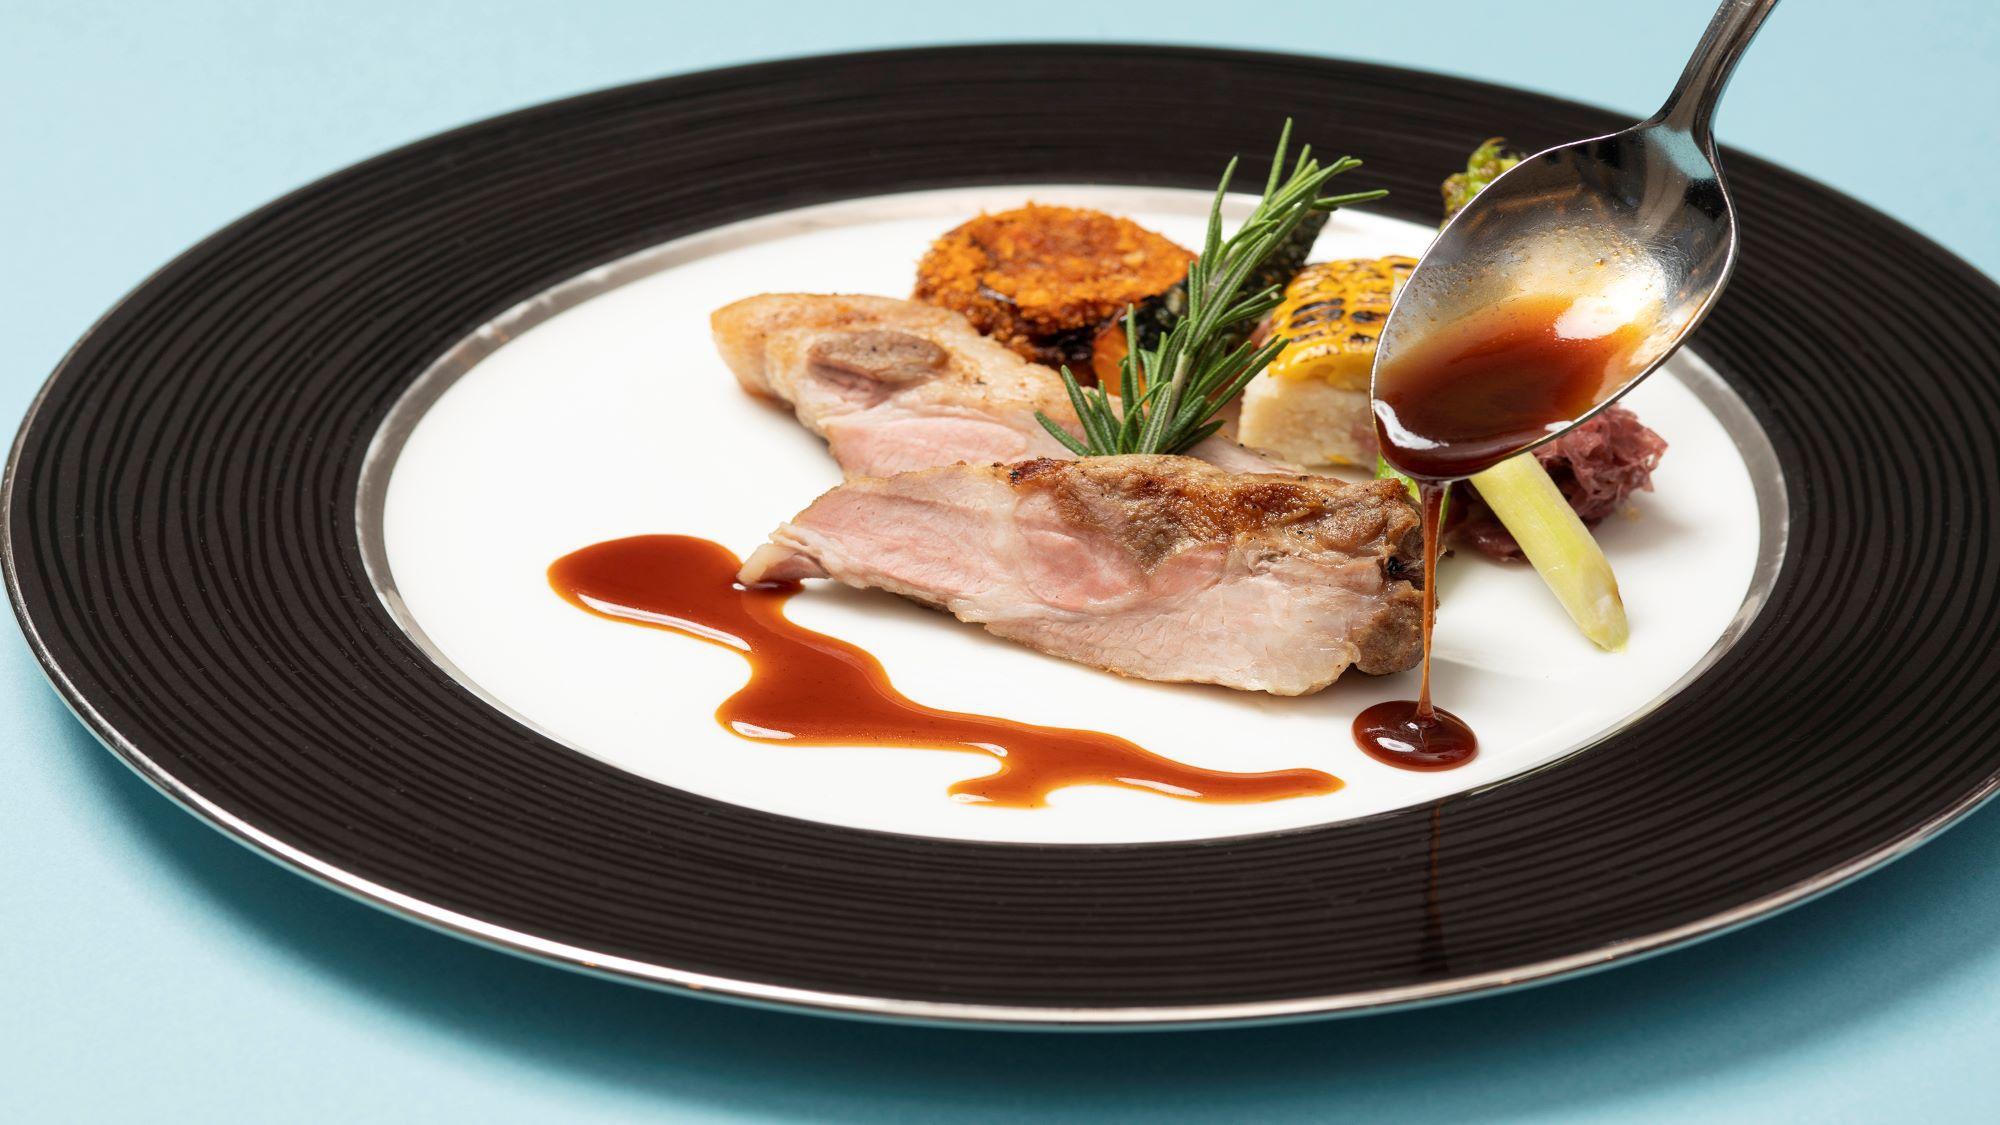 Dine & Stay〜お部屋で満喫おこもりステイ〜(インルームダイニング夕食付き)